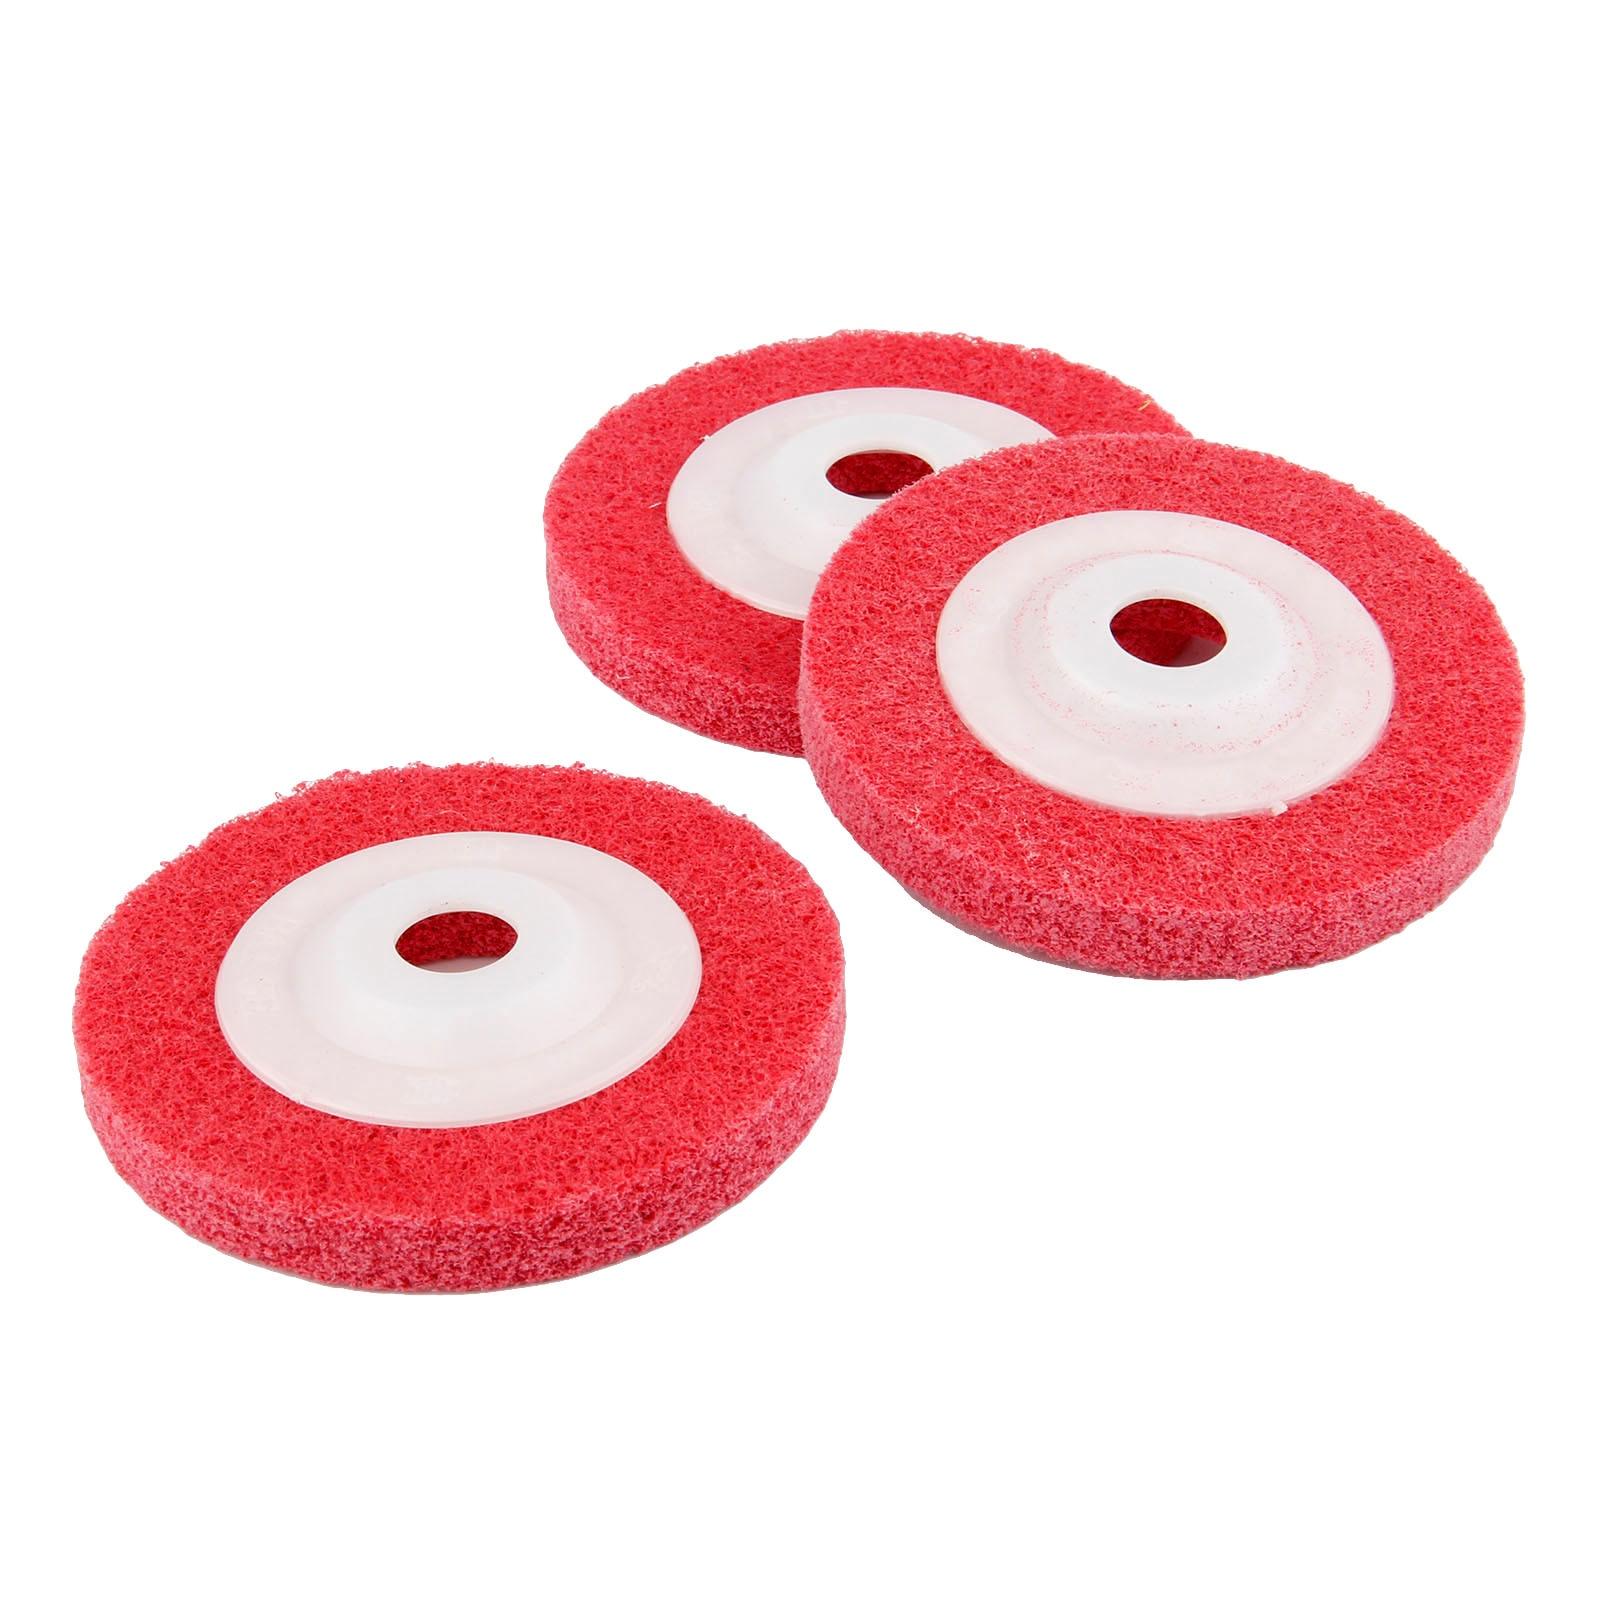 DRELD 1Pc 100mm 4 Inch Fiber Polishing Wheel Buffing Pad Grinding Abrasive Disc For Dremel Rotary Tool 4 Grits 180/240/320